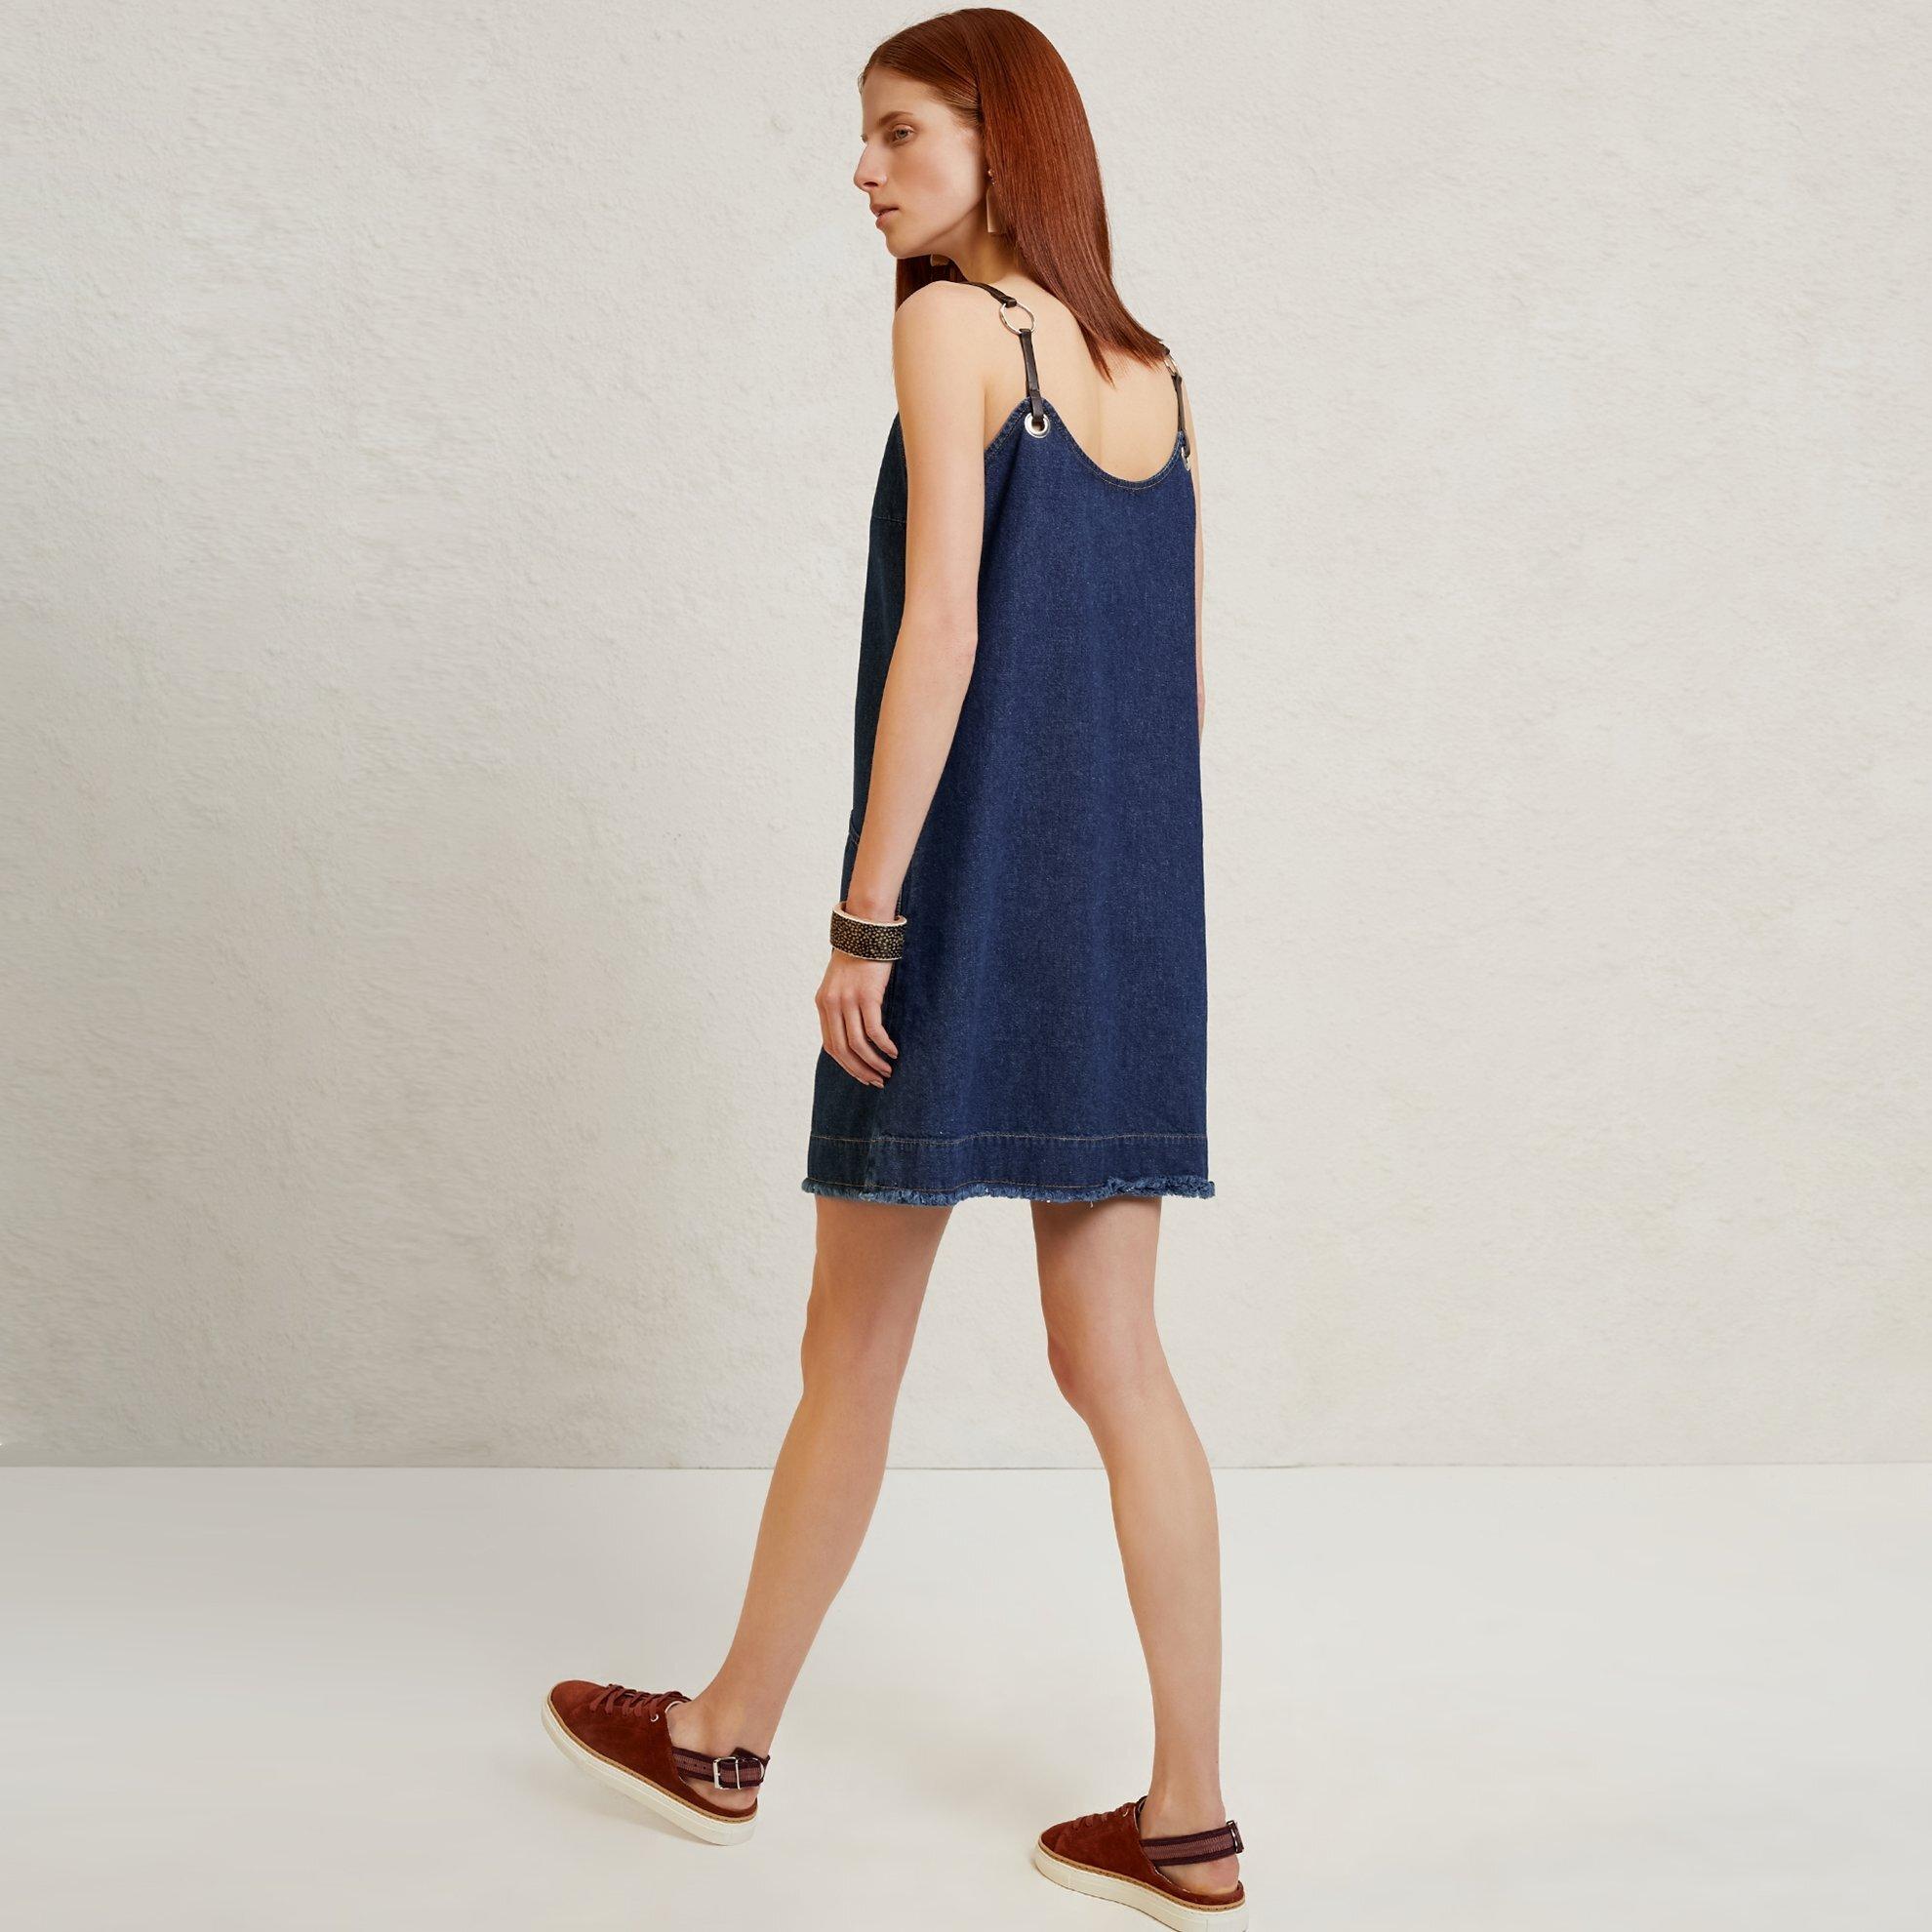 Strap Detailed Denim Dress